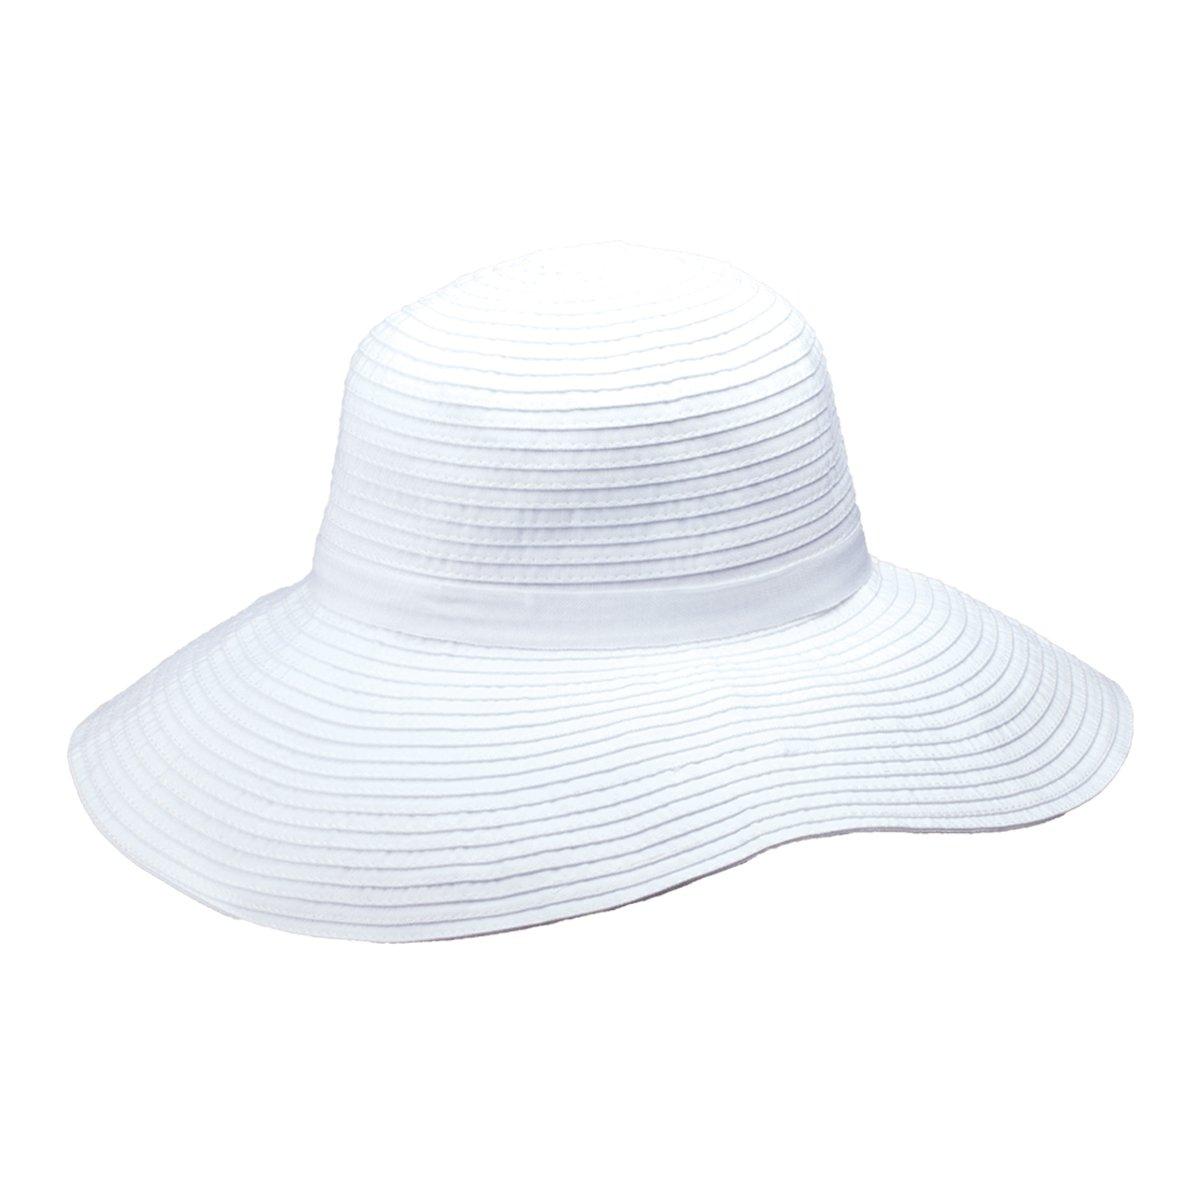 Peter Grimm Womens Malena Resort Hat White